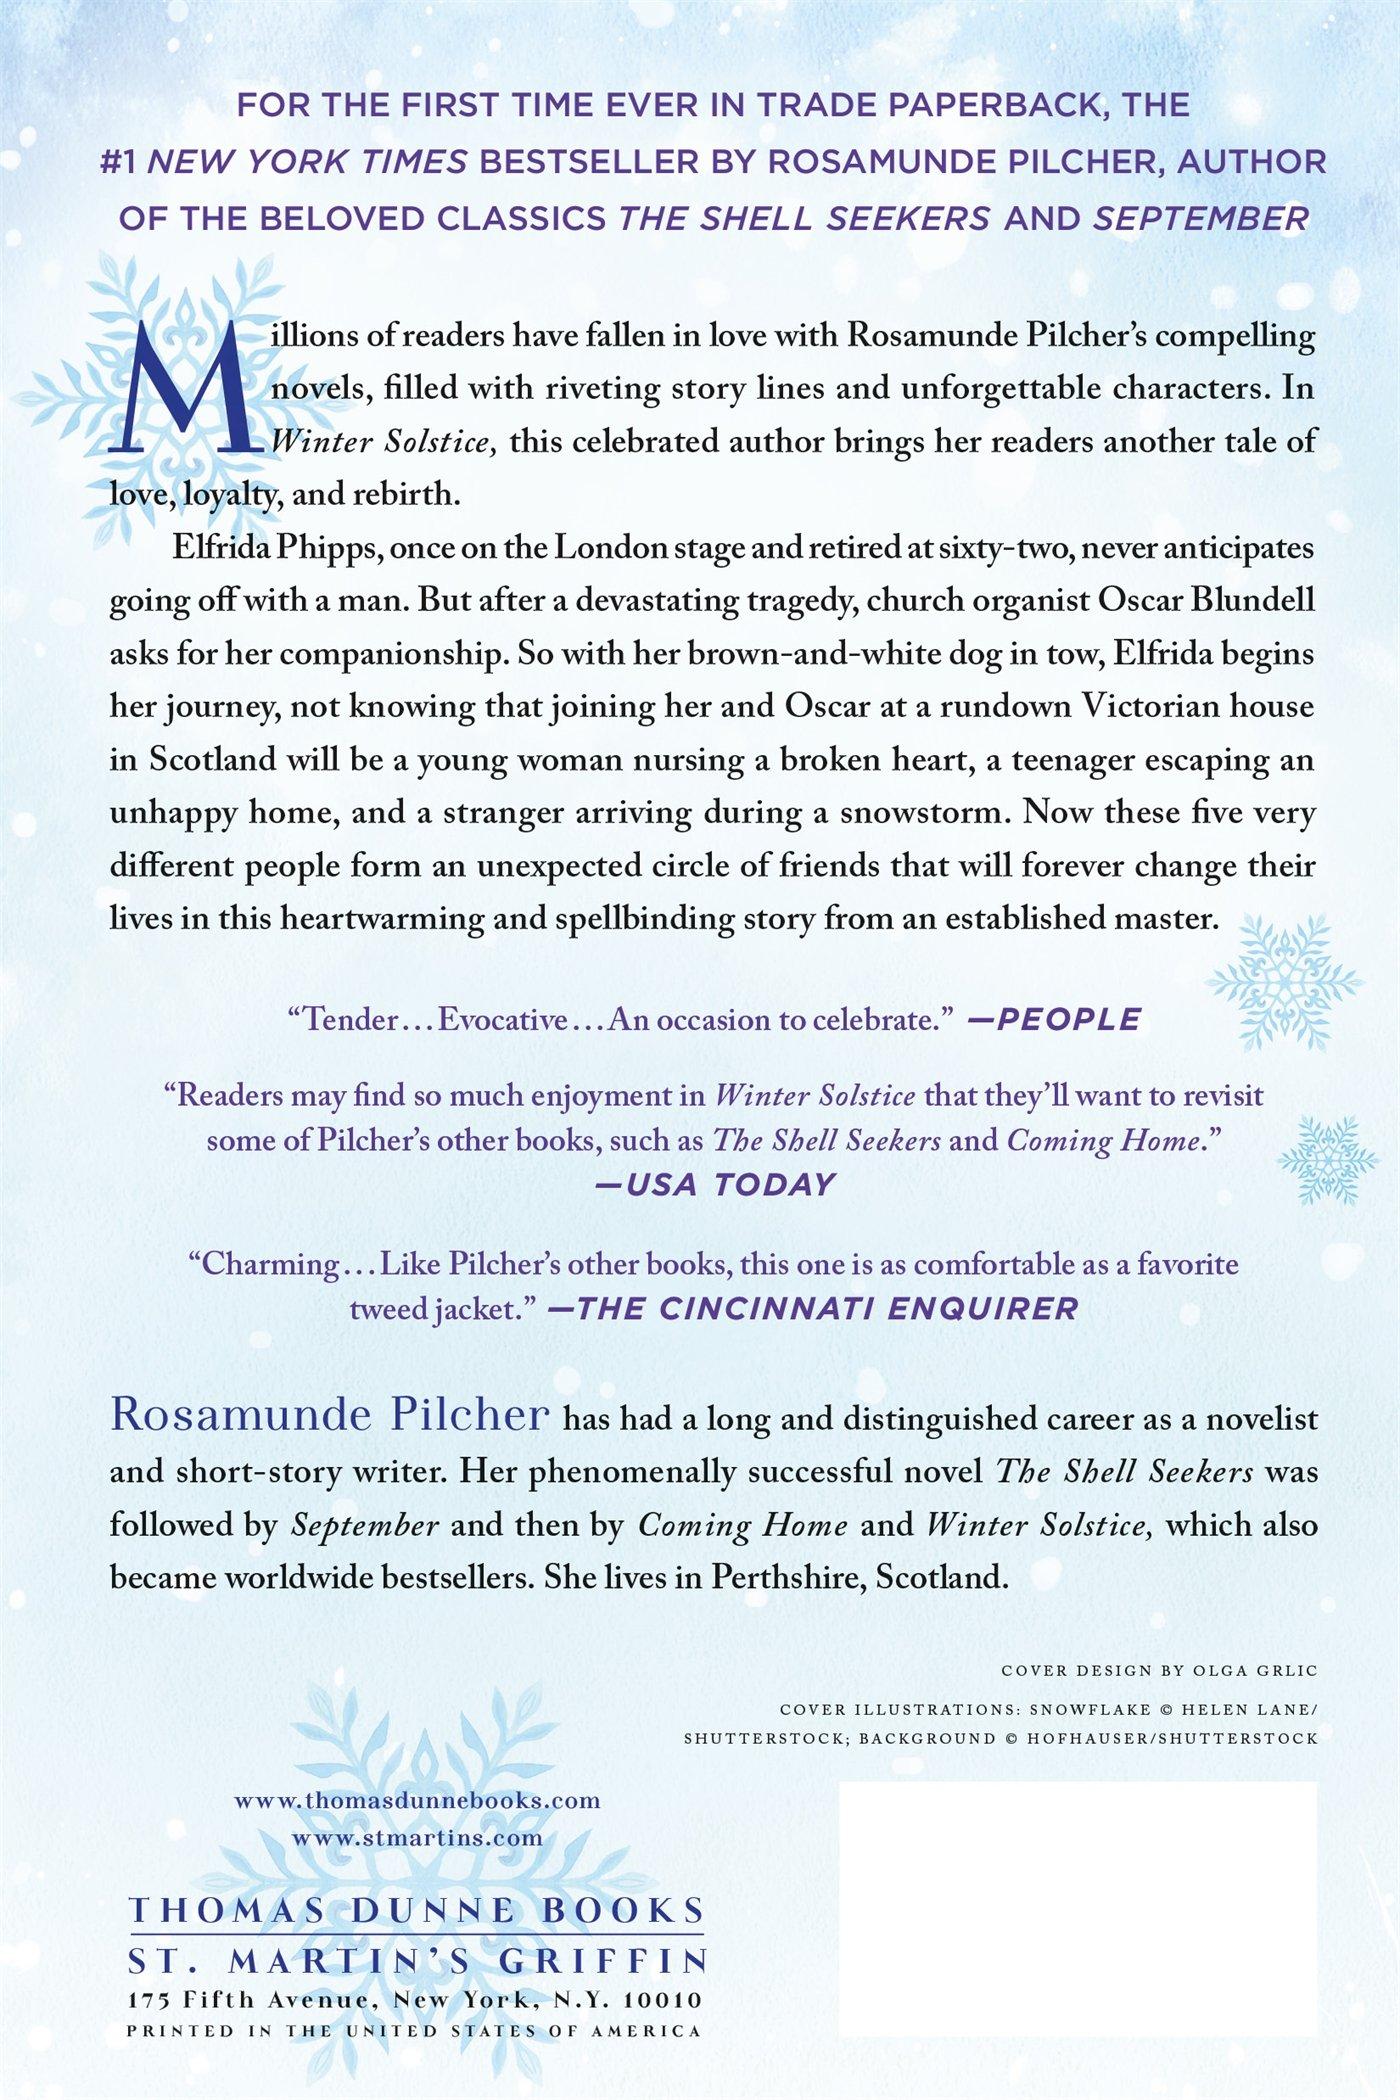 Winter Solstice: Amazon.co.uk: Rosamunde Pilcher: 9781250077462: Books